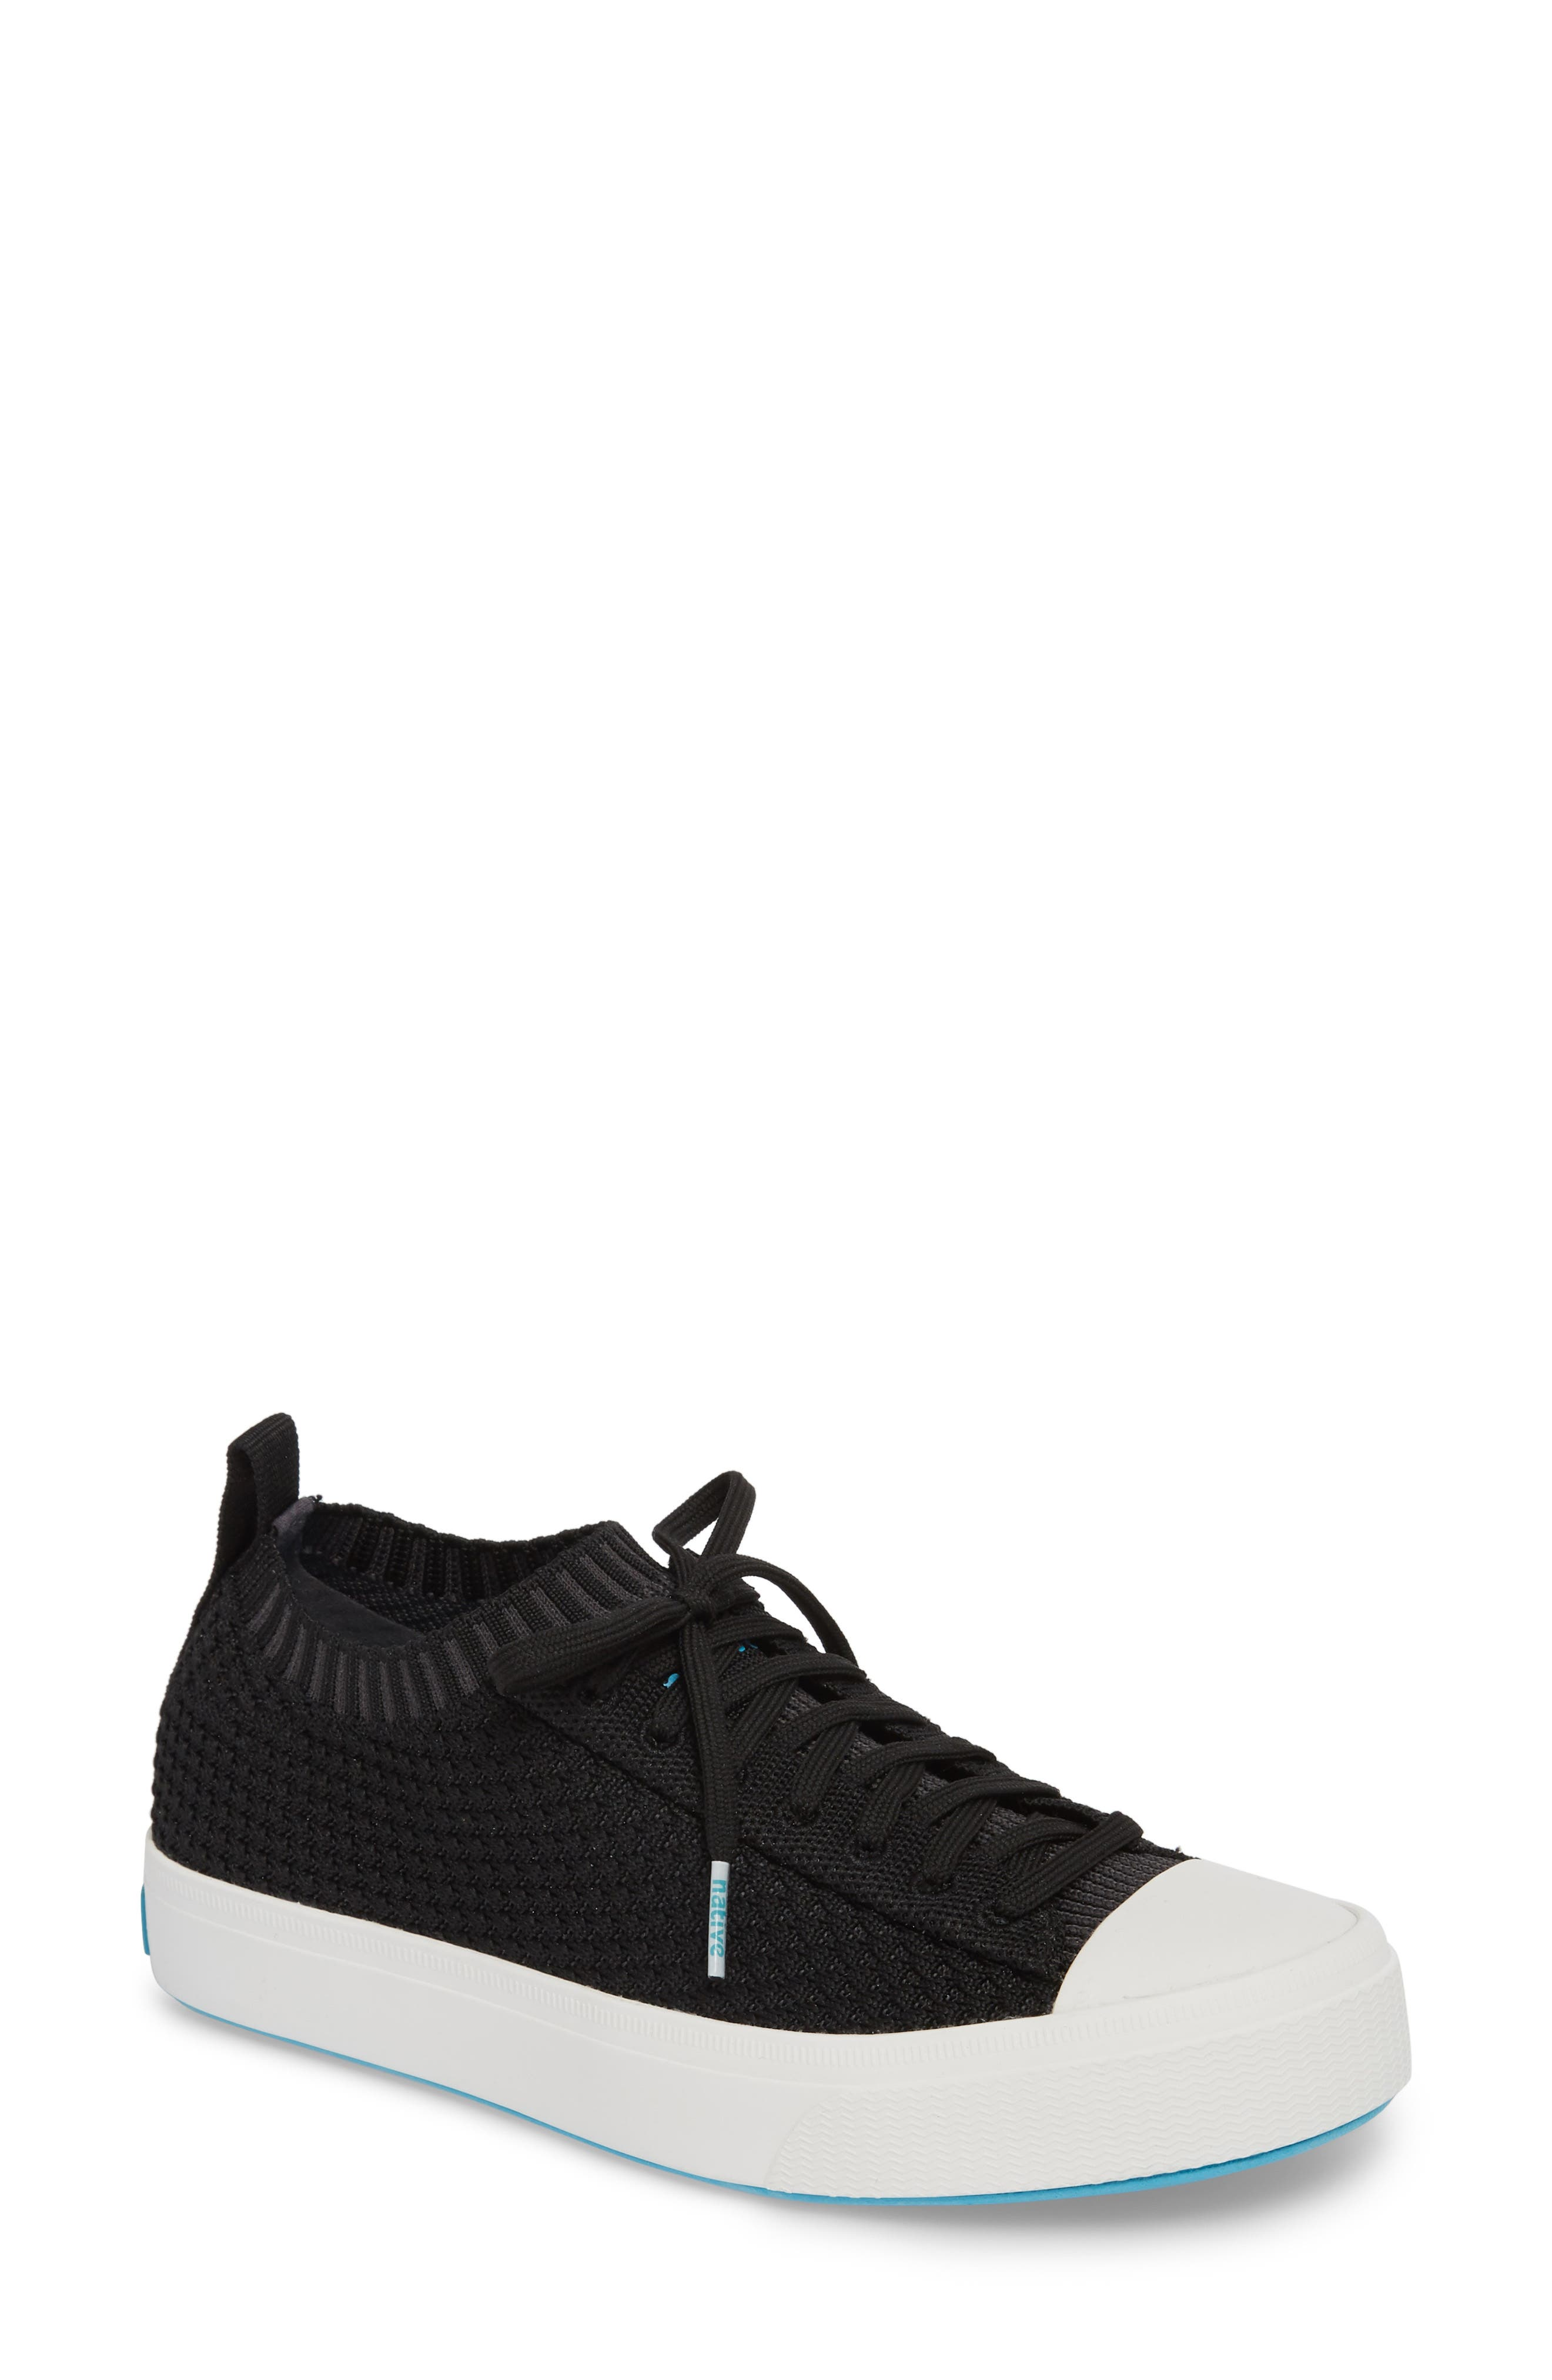 Native Shoes Jefferson 2.0 Liteknit Sneaker